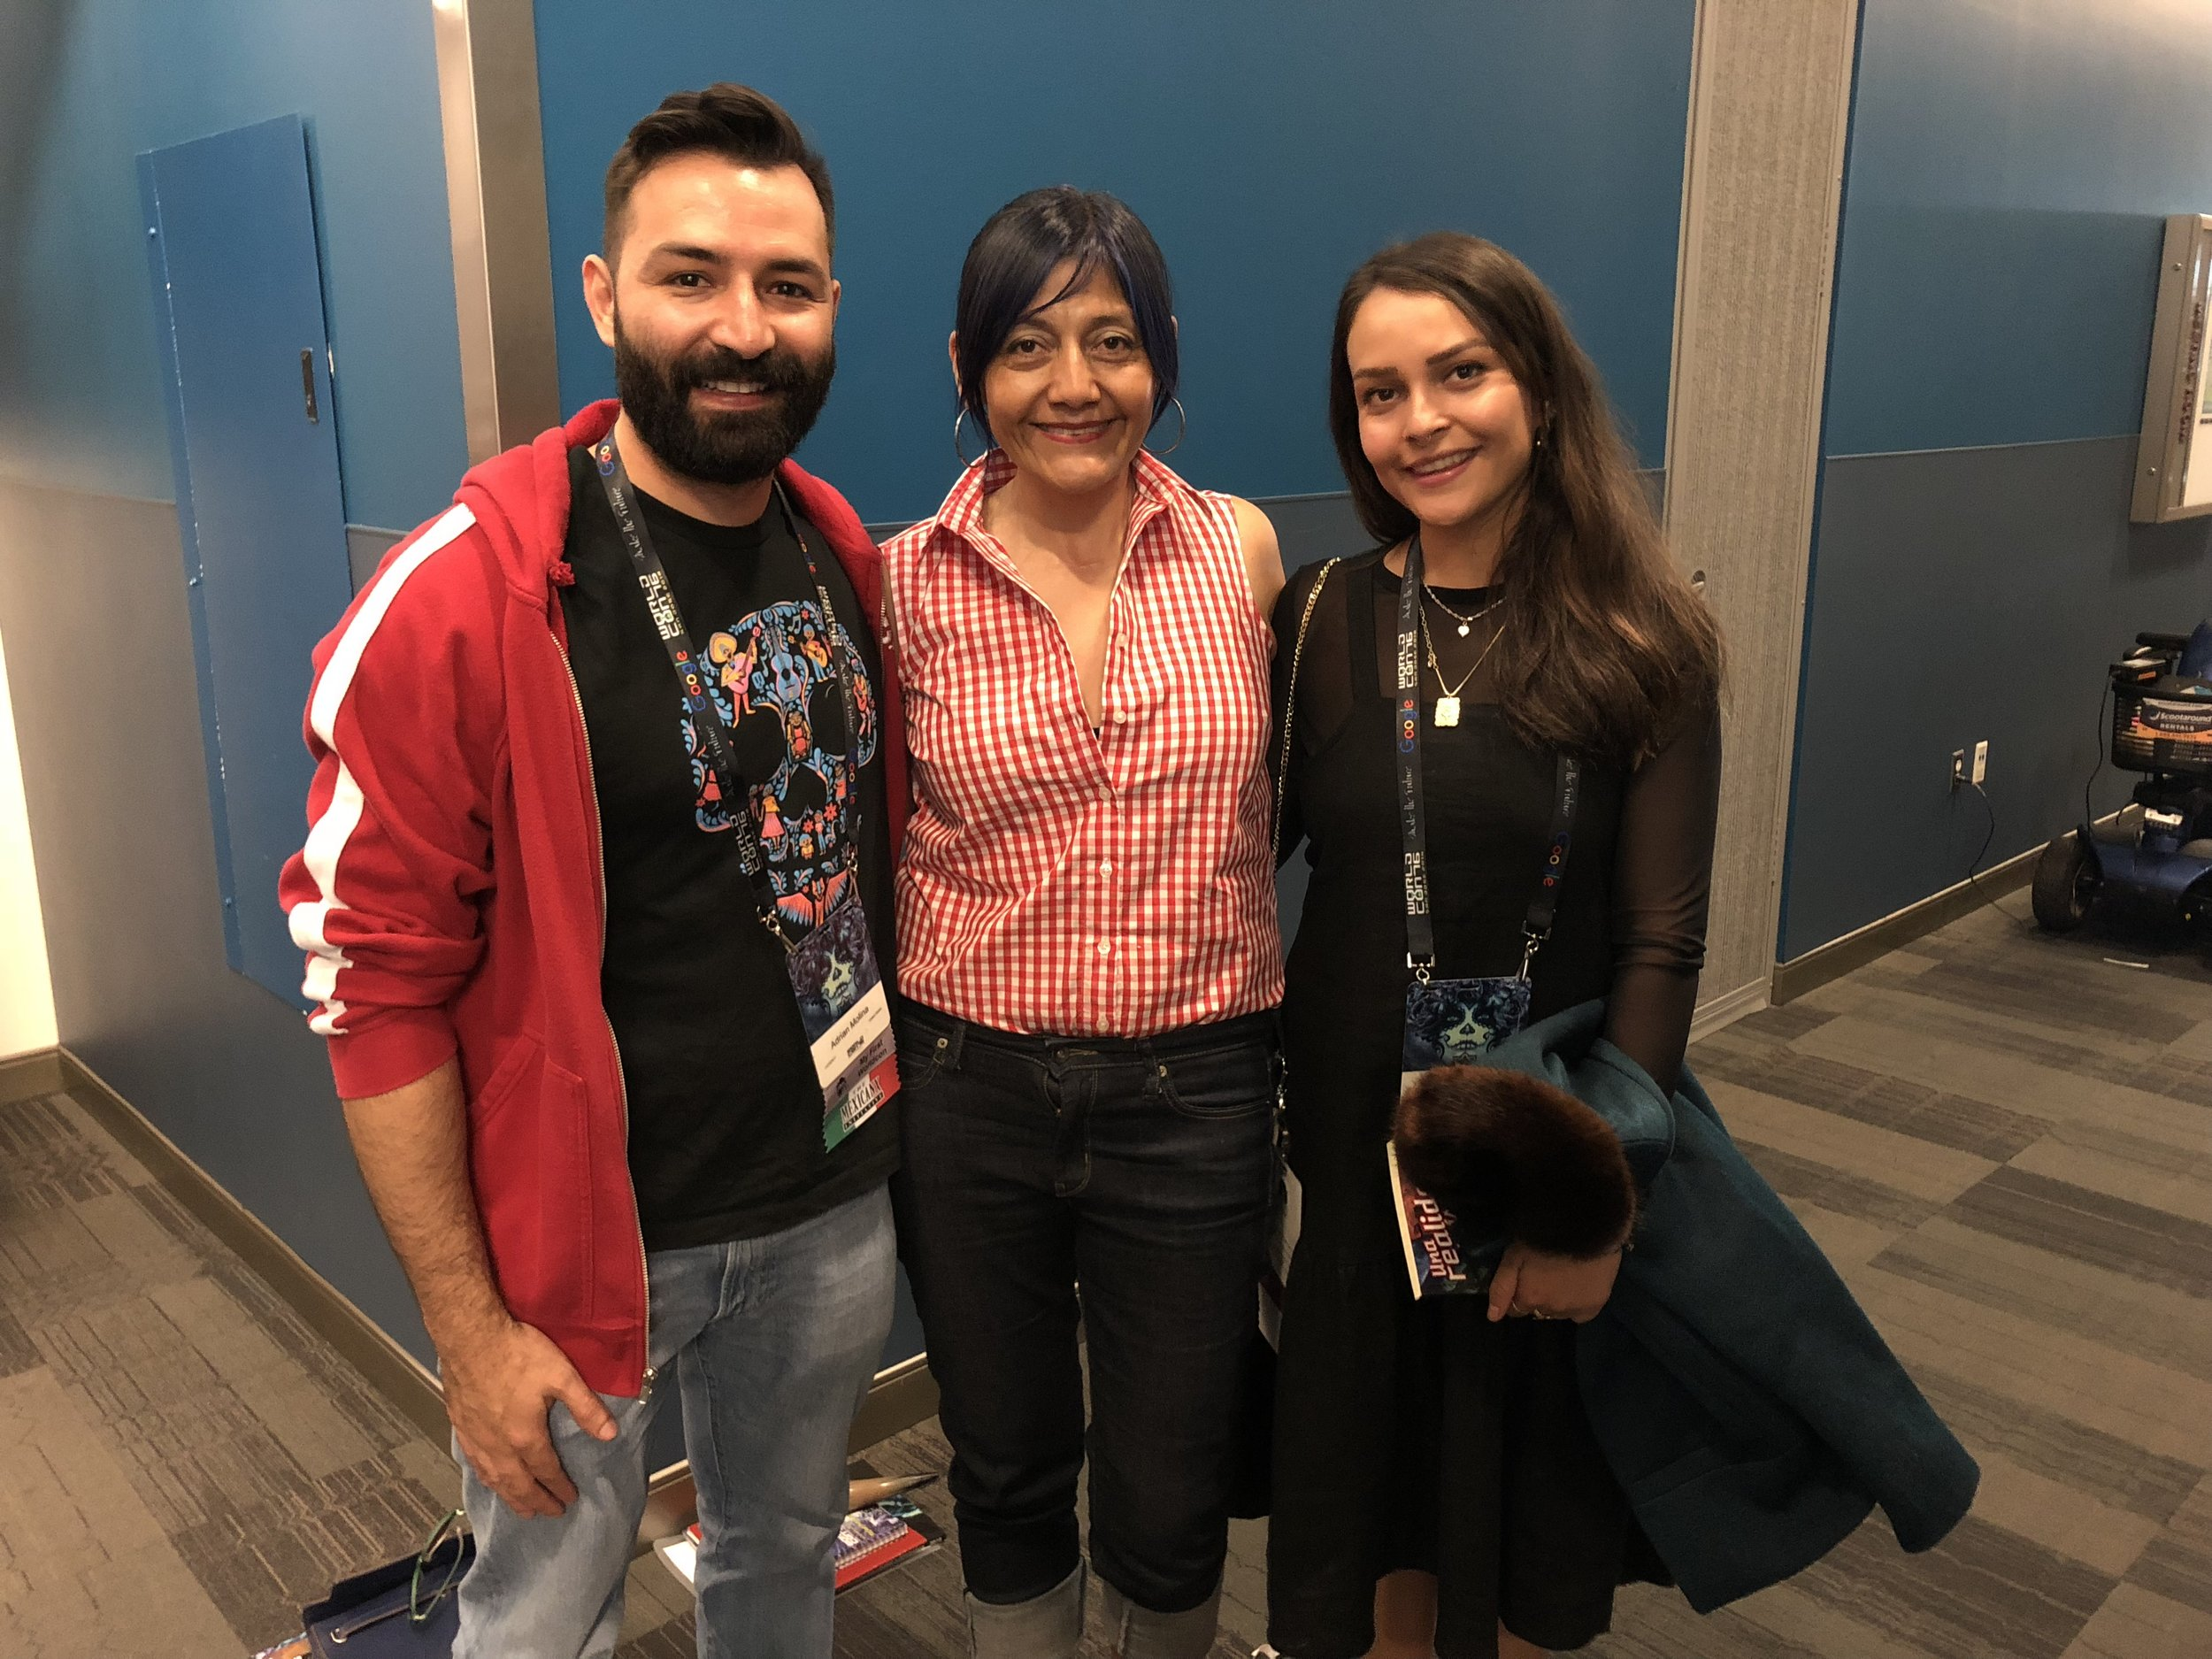 Adrian Molina, Patty Garcia, and Ana Ramirez (Sent by Patty Garcia; photo by Anonymous on Patty's phone)